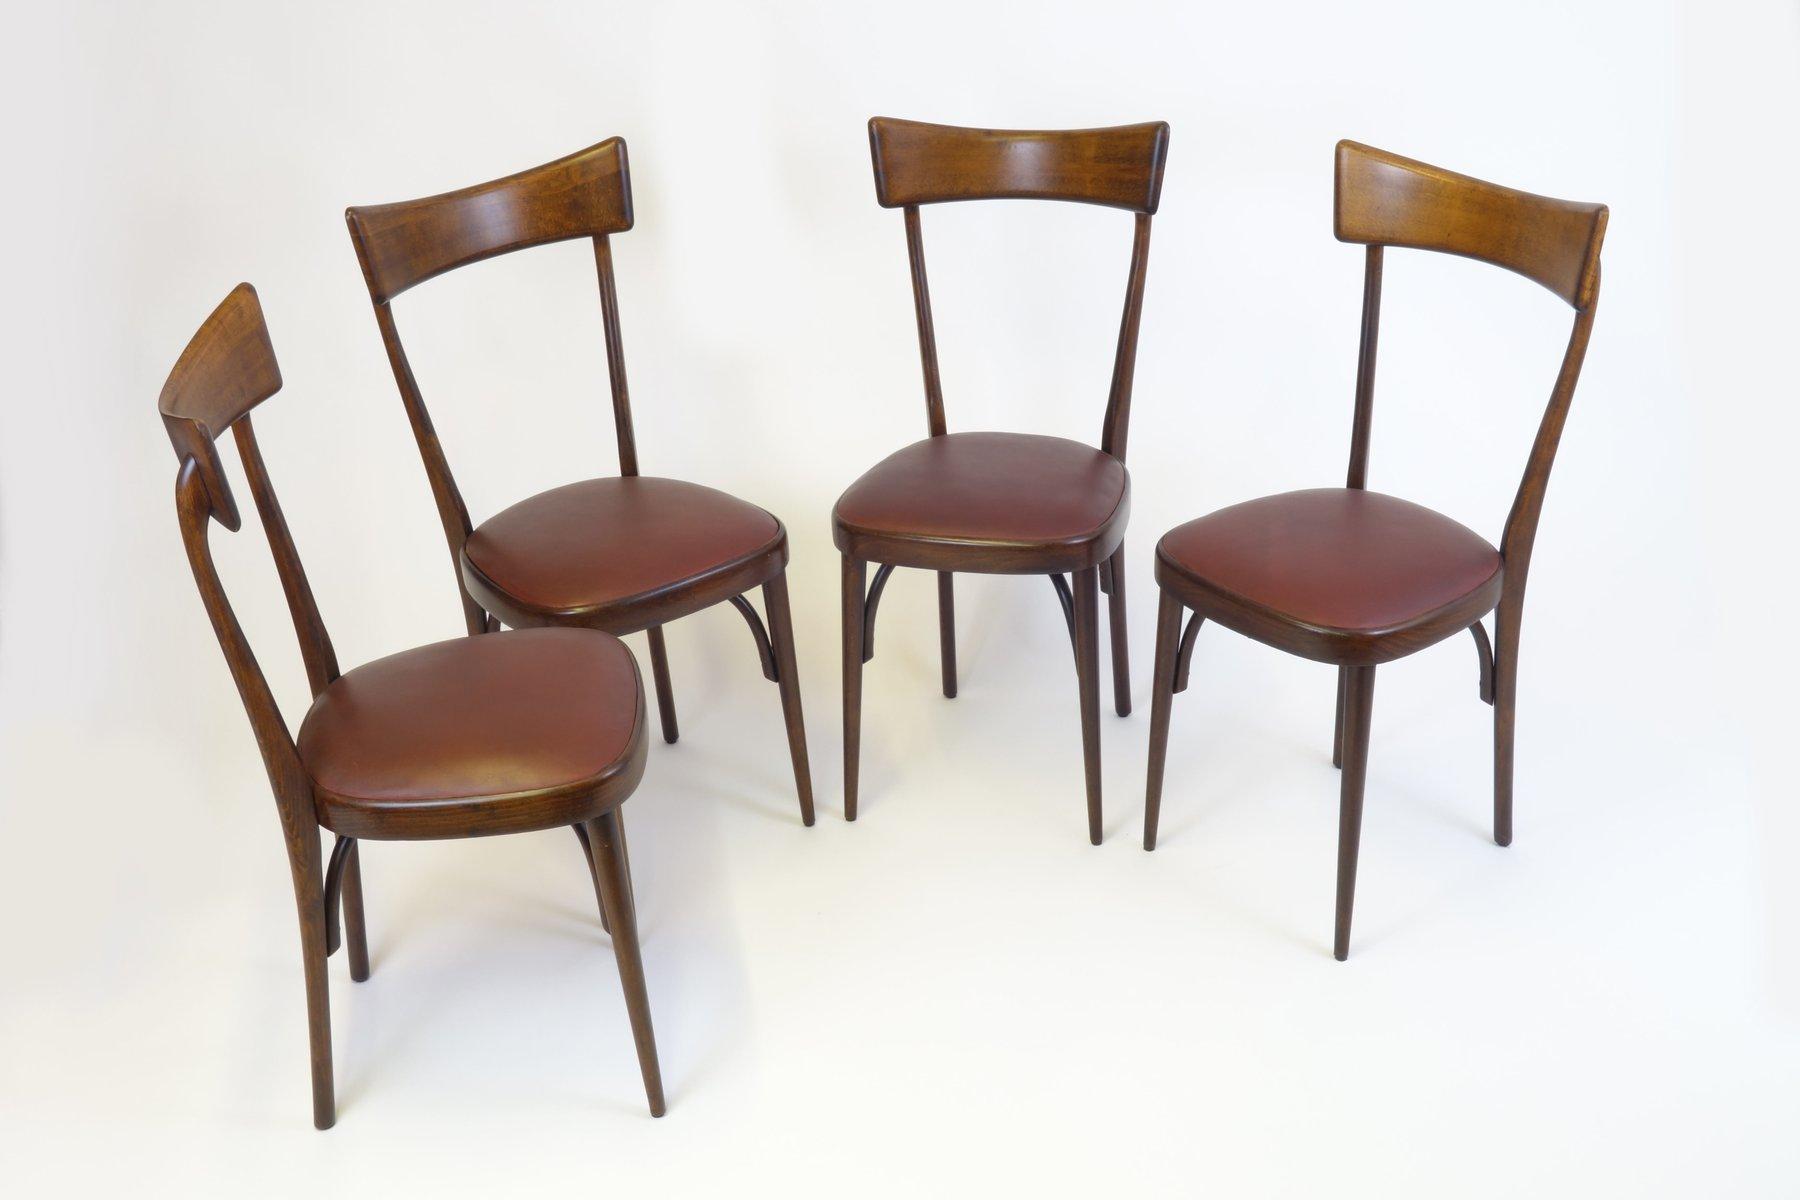 italienische mid century mahagoni esszimmerst hle 4er set bei pamono kaufen. Black Bedroom Furniture Sets. Home Design Ideas